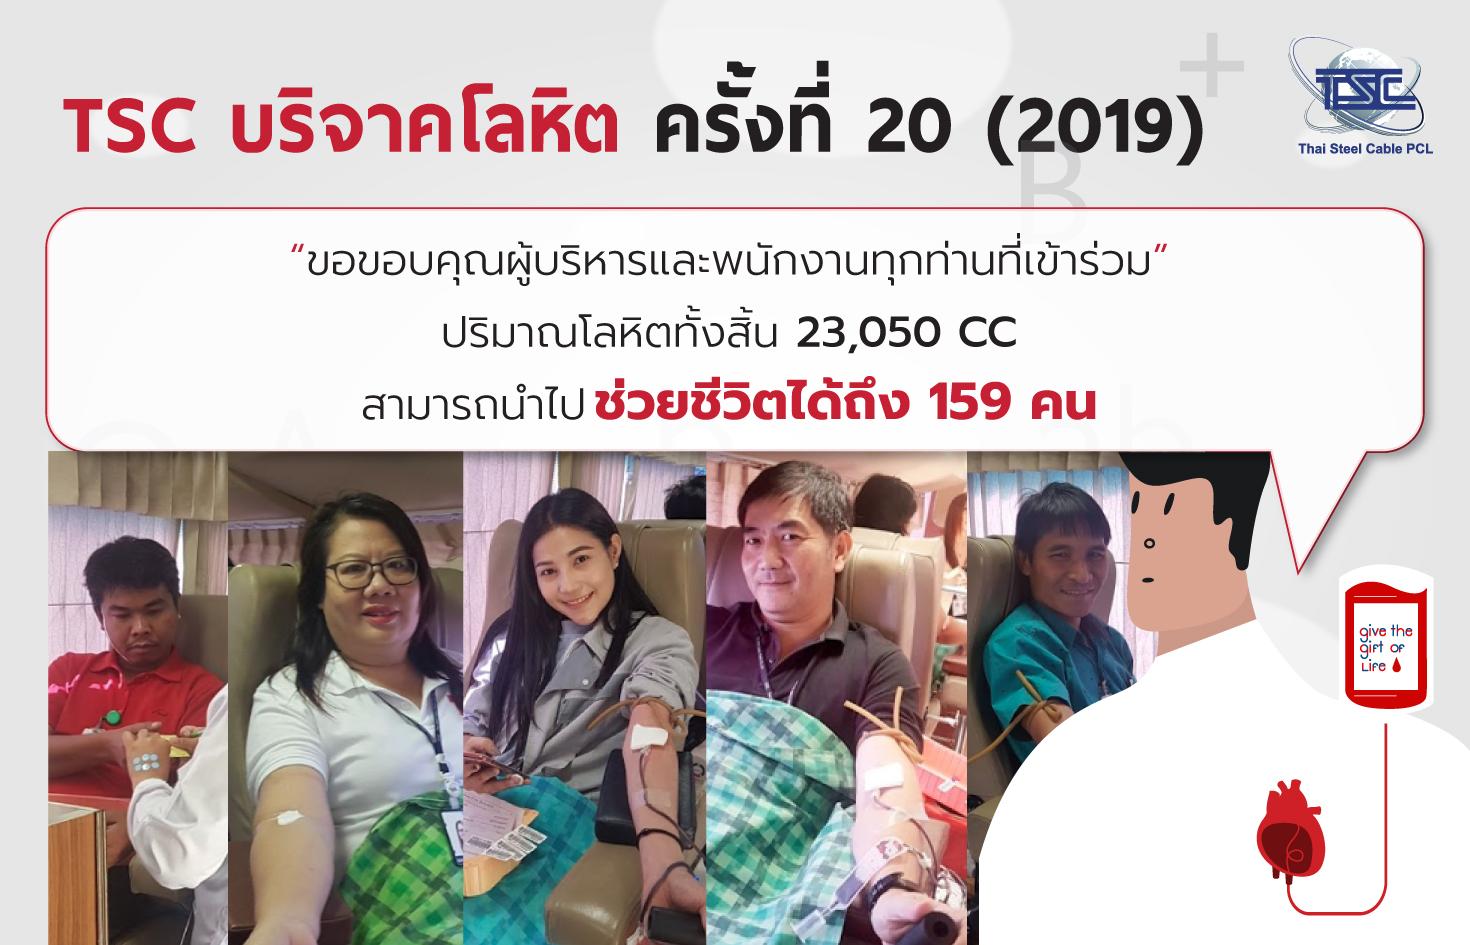 TSC Blood Donation #20 (2019)